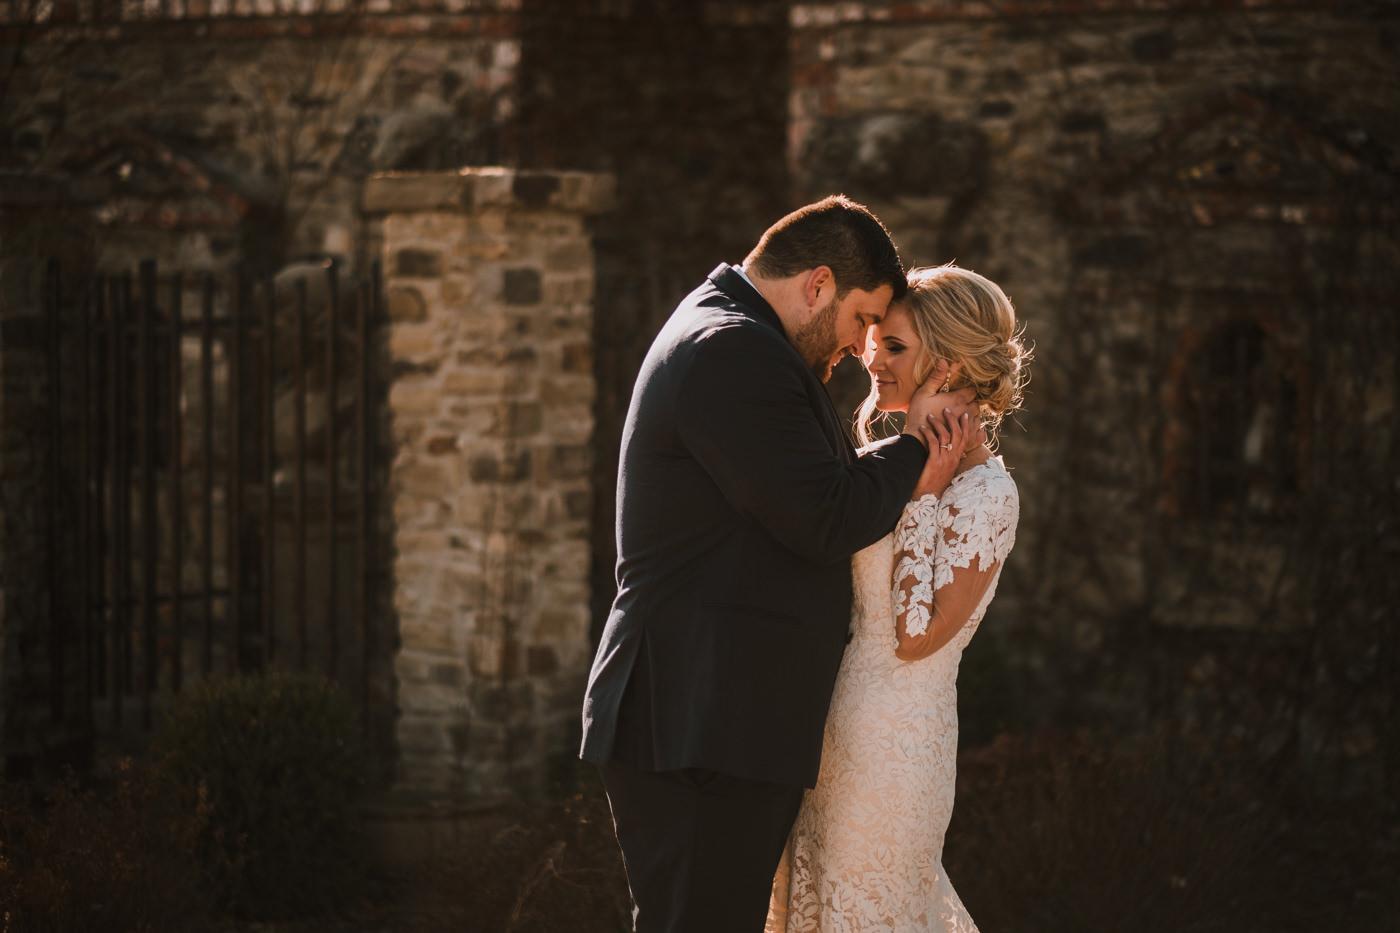 ravington.wedding.northwestarkansas.mileswittboyer-21.jpg